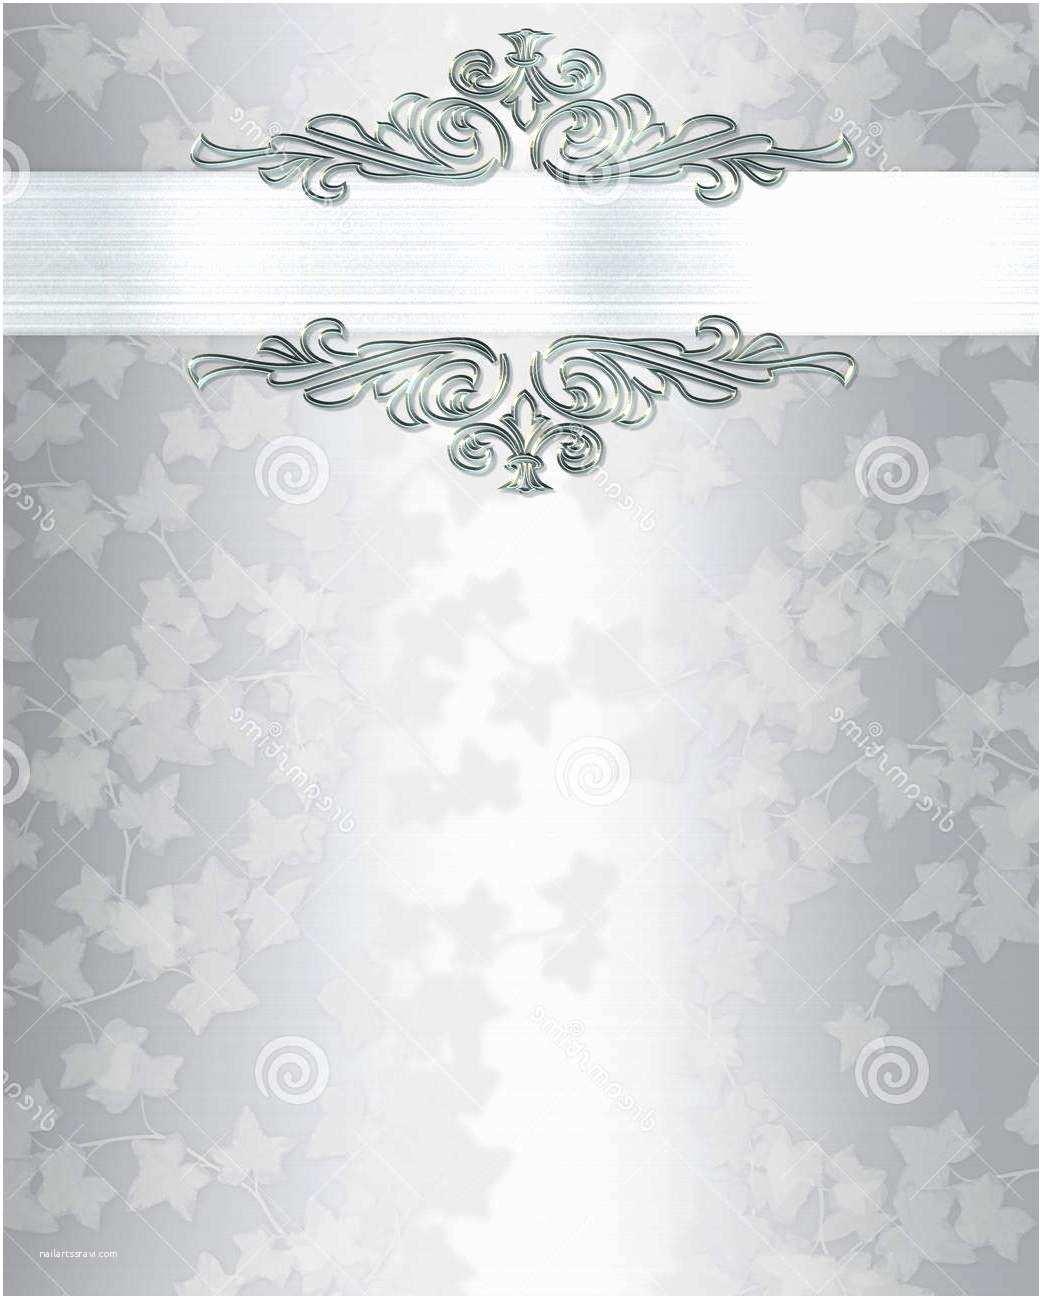 Blank Wedding Invitation Templates Blank Wedding Invitations Blank Wedding Invitations for